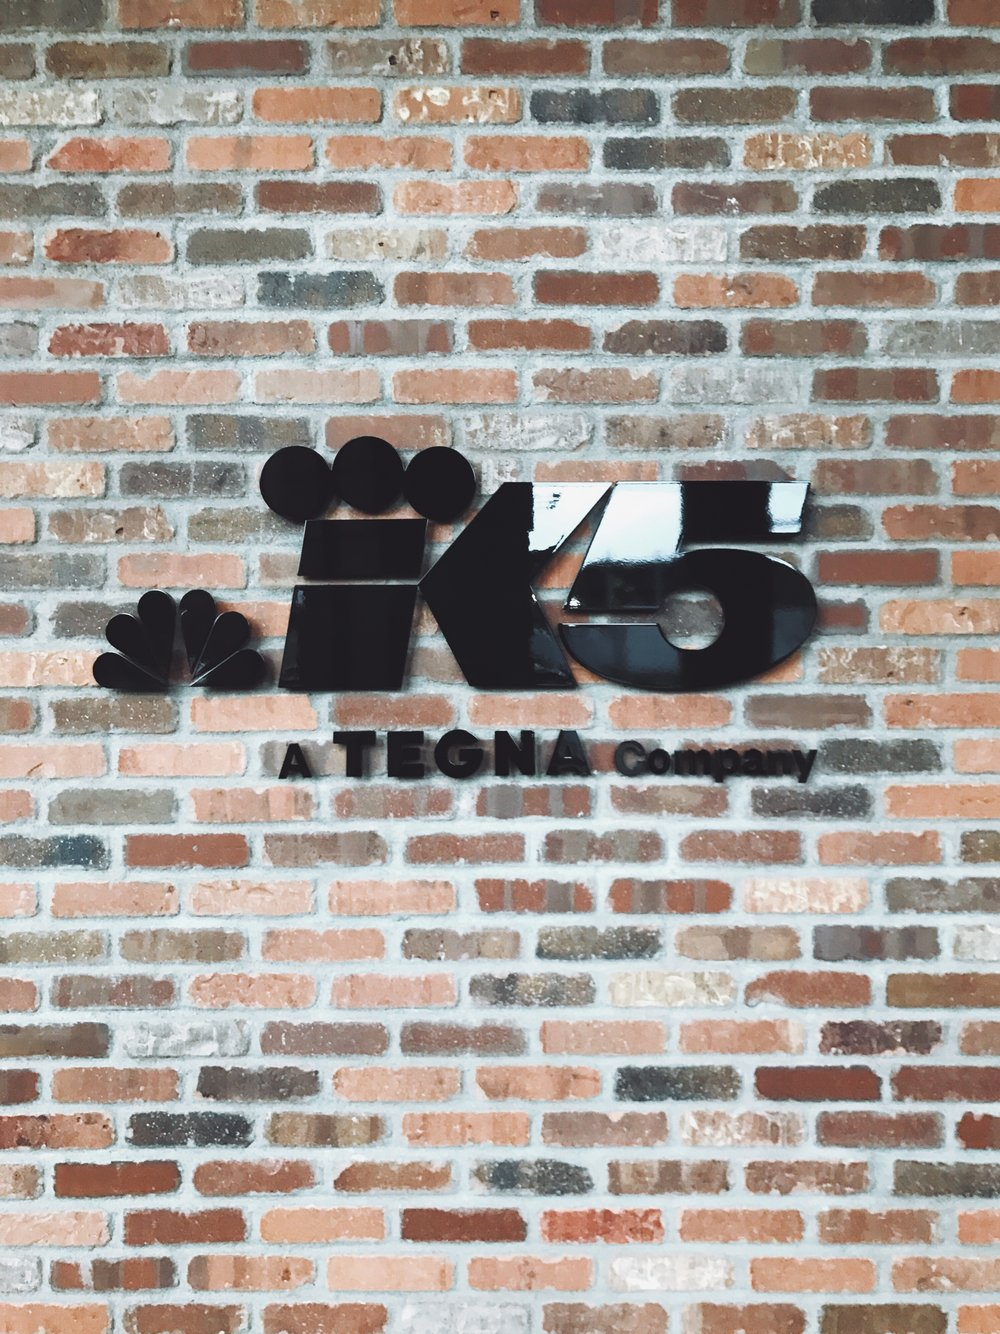 kIng 5 news Seattle .JPG